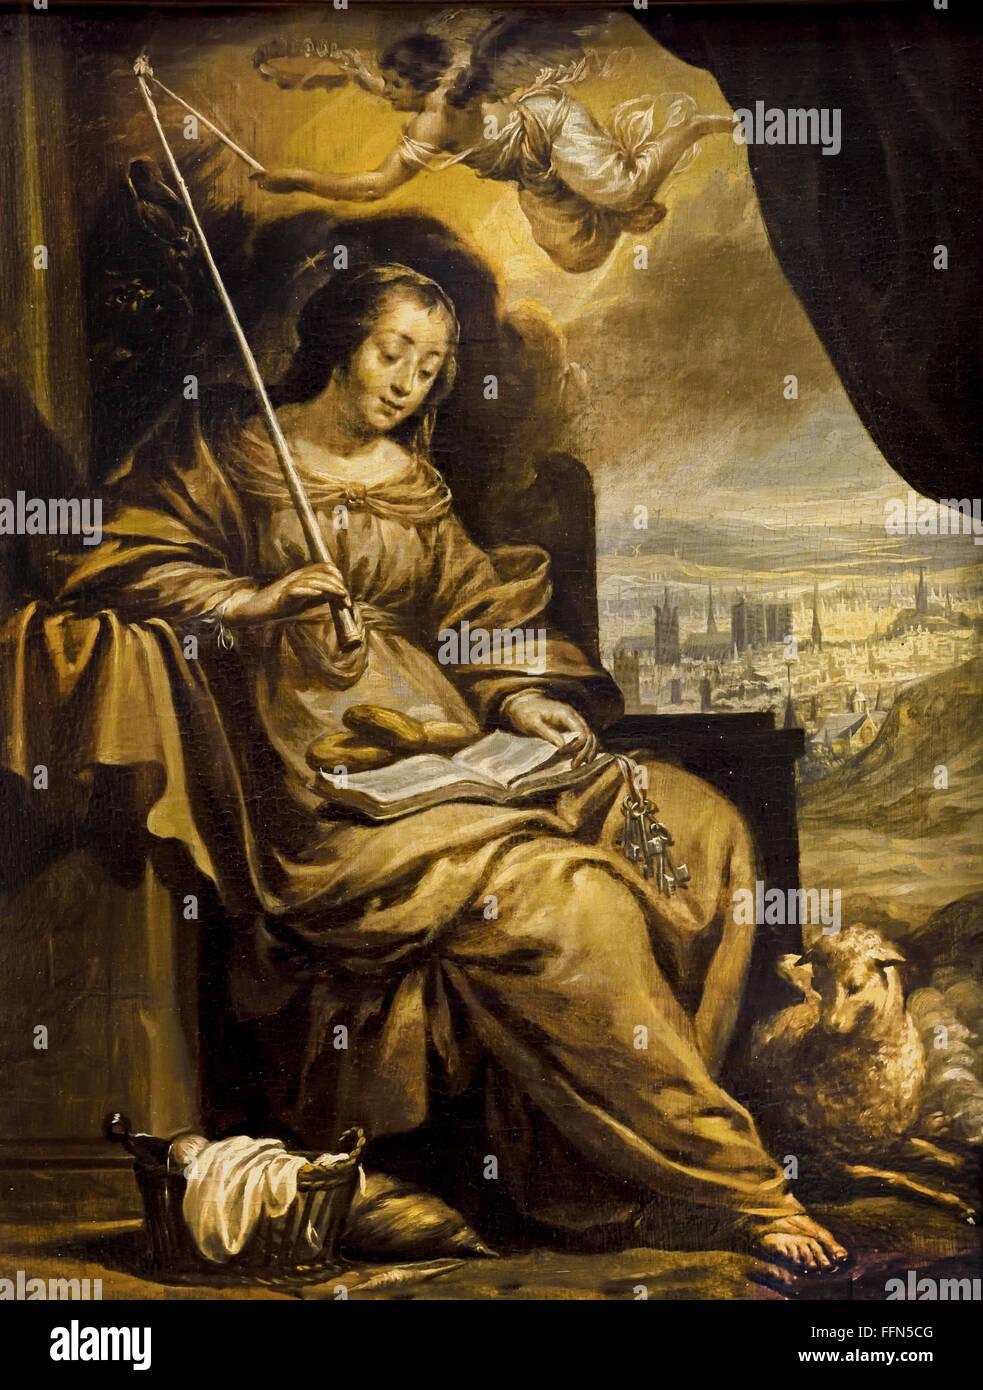 Saint Genevieve byCharles Le Brun 1619-1690  France French Stock Photo